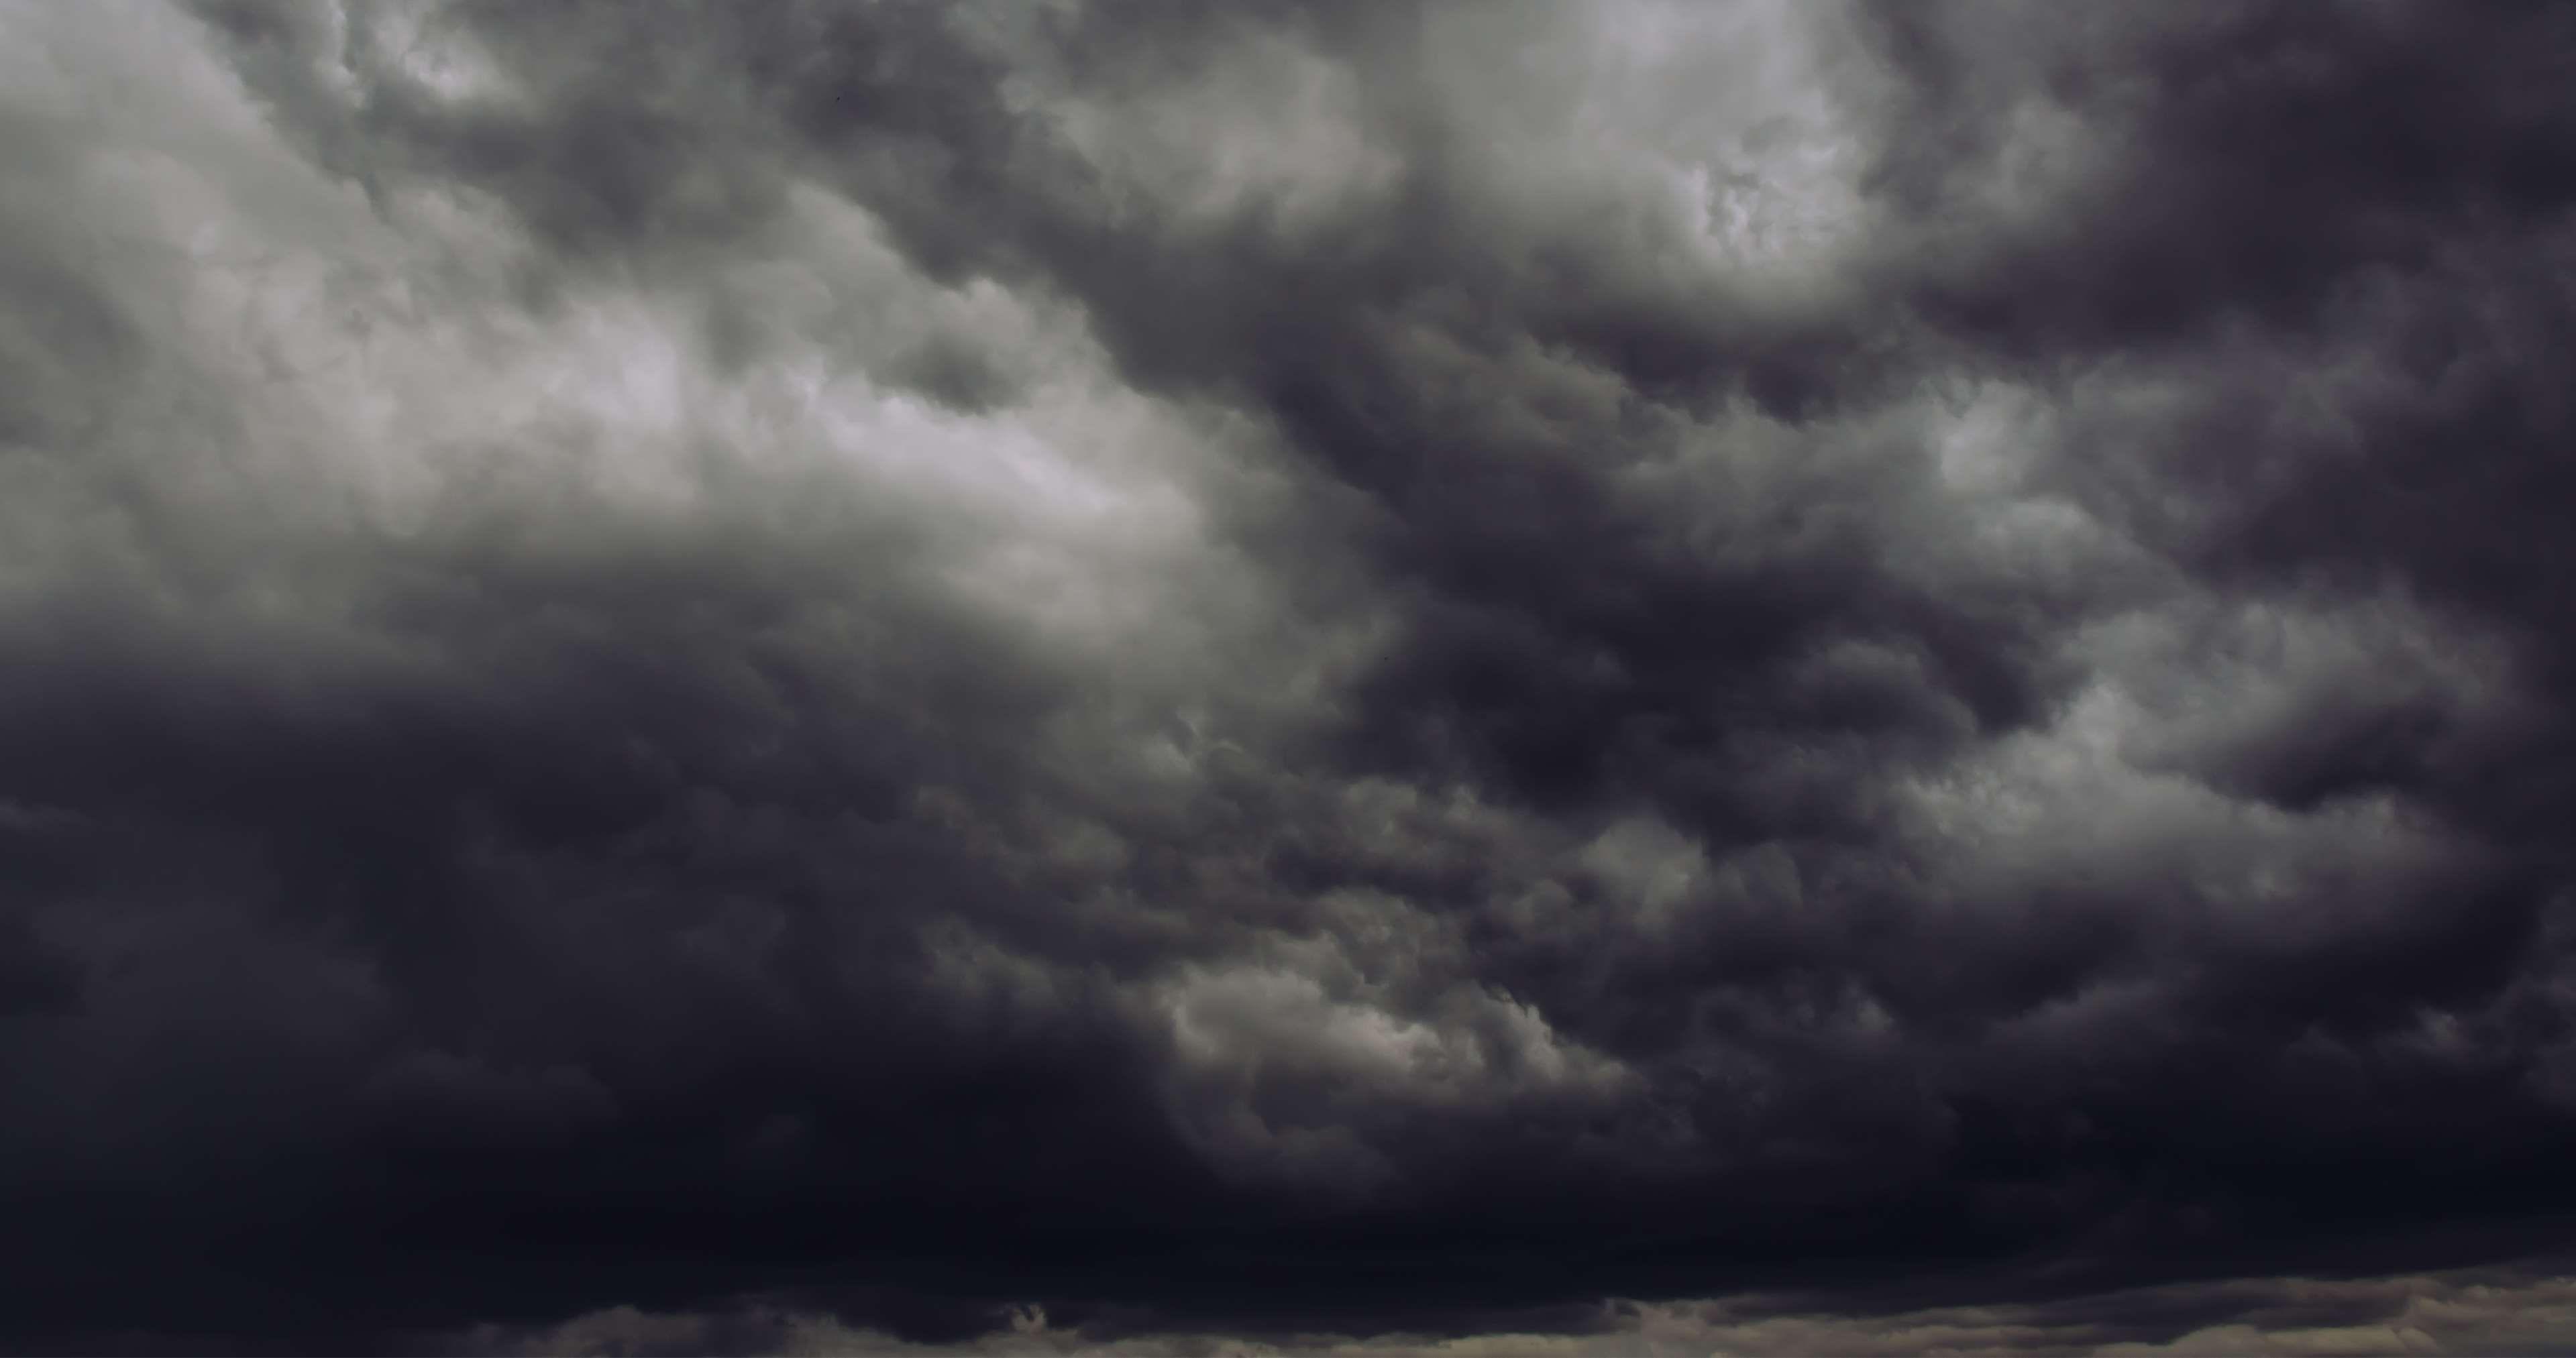 Dark Clouds Storm Thunderstorm 4k Wallpaper Hdwallpaper Desktop Dark Clouds Storm Clouds Thunderstorm Clouds